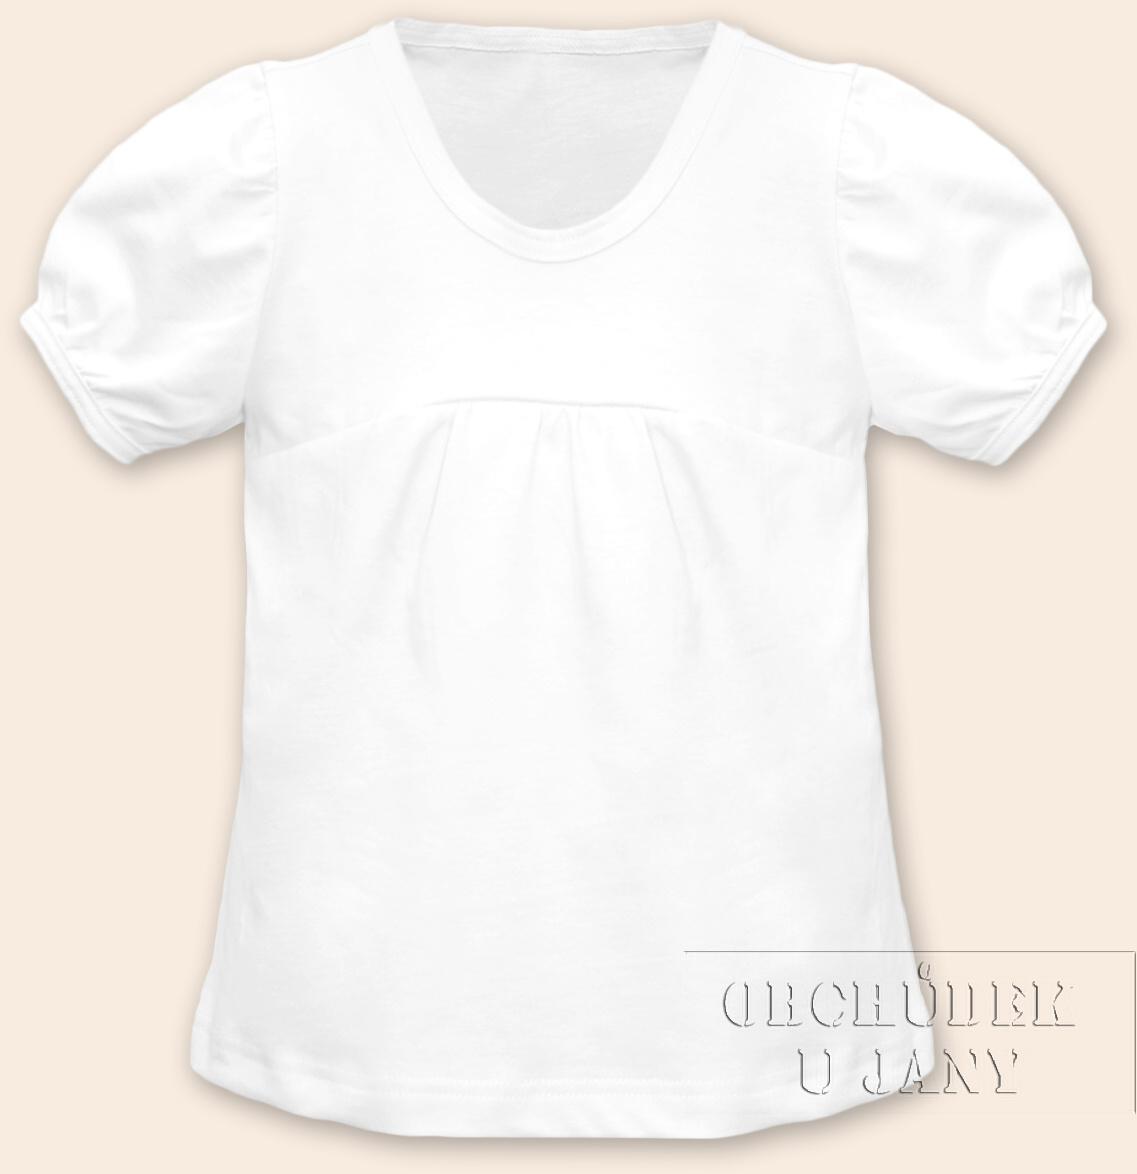 Dívčí tričko jednobarevné bílé